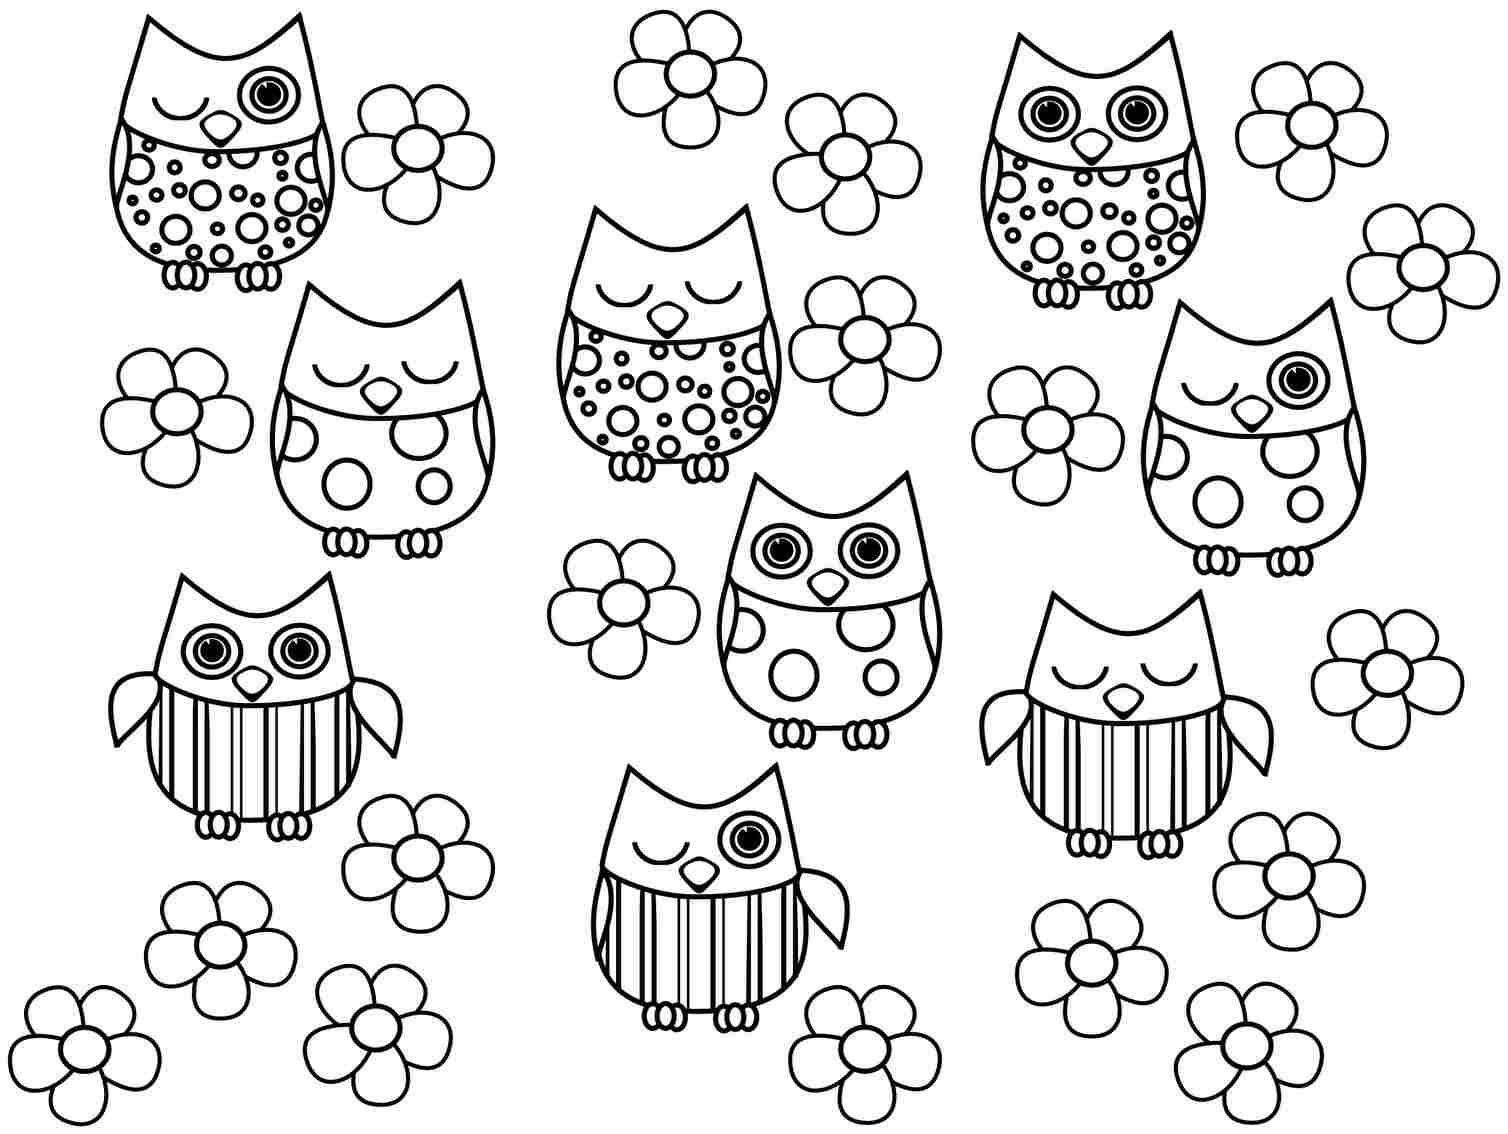 Print Full Size Image Free Colouring Sheets Animal Owl